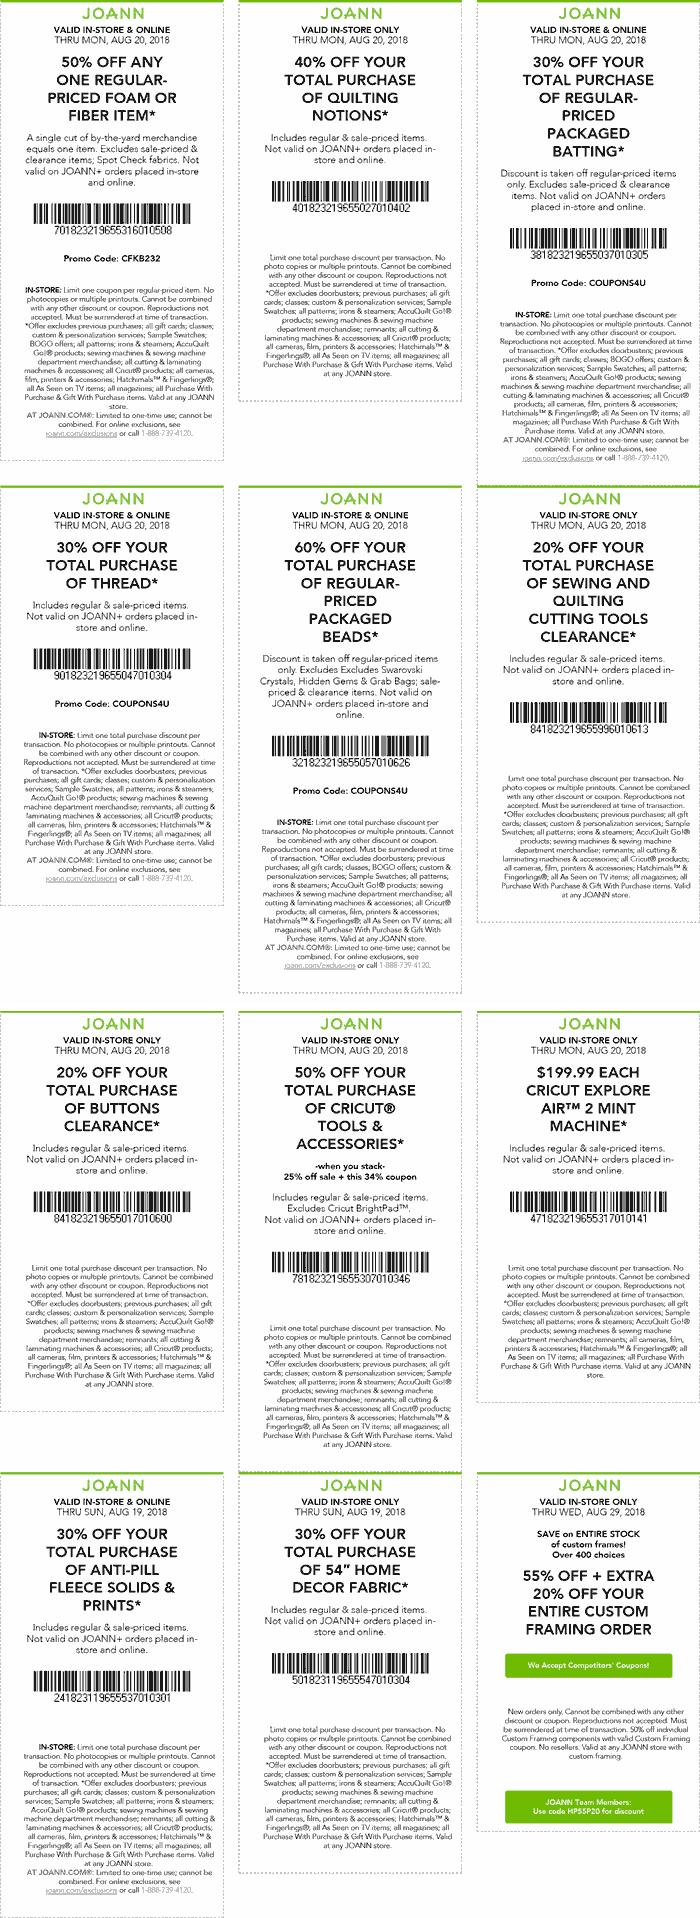 Joann coupons & promo code for [June 2020]